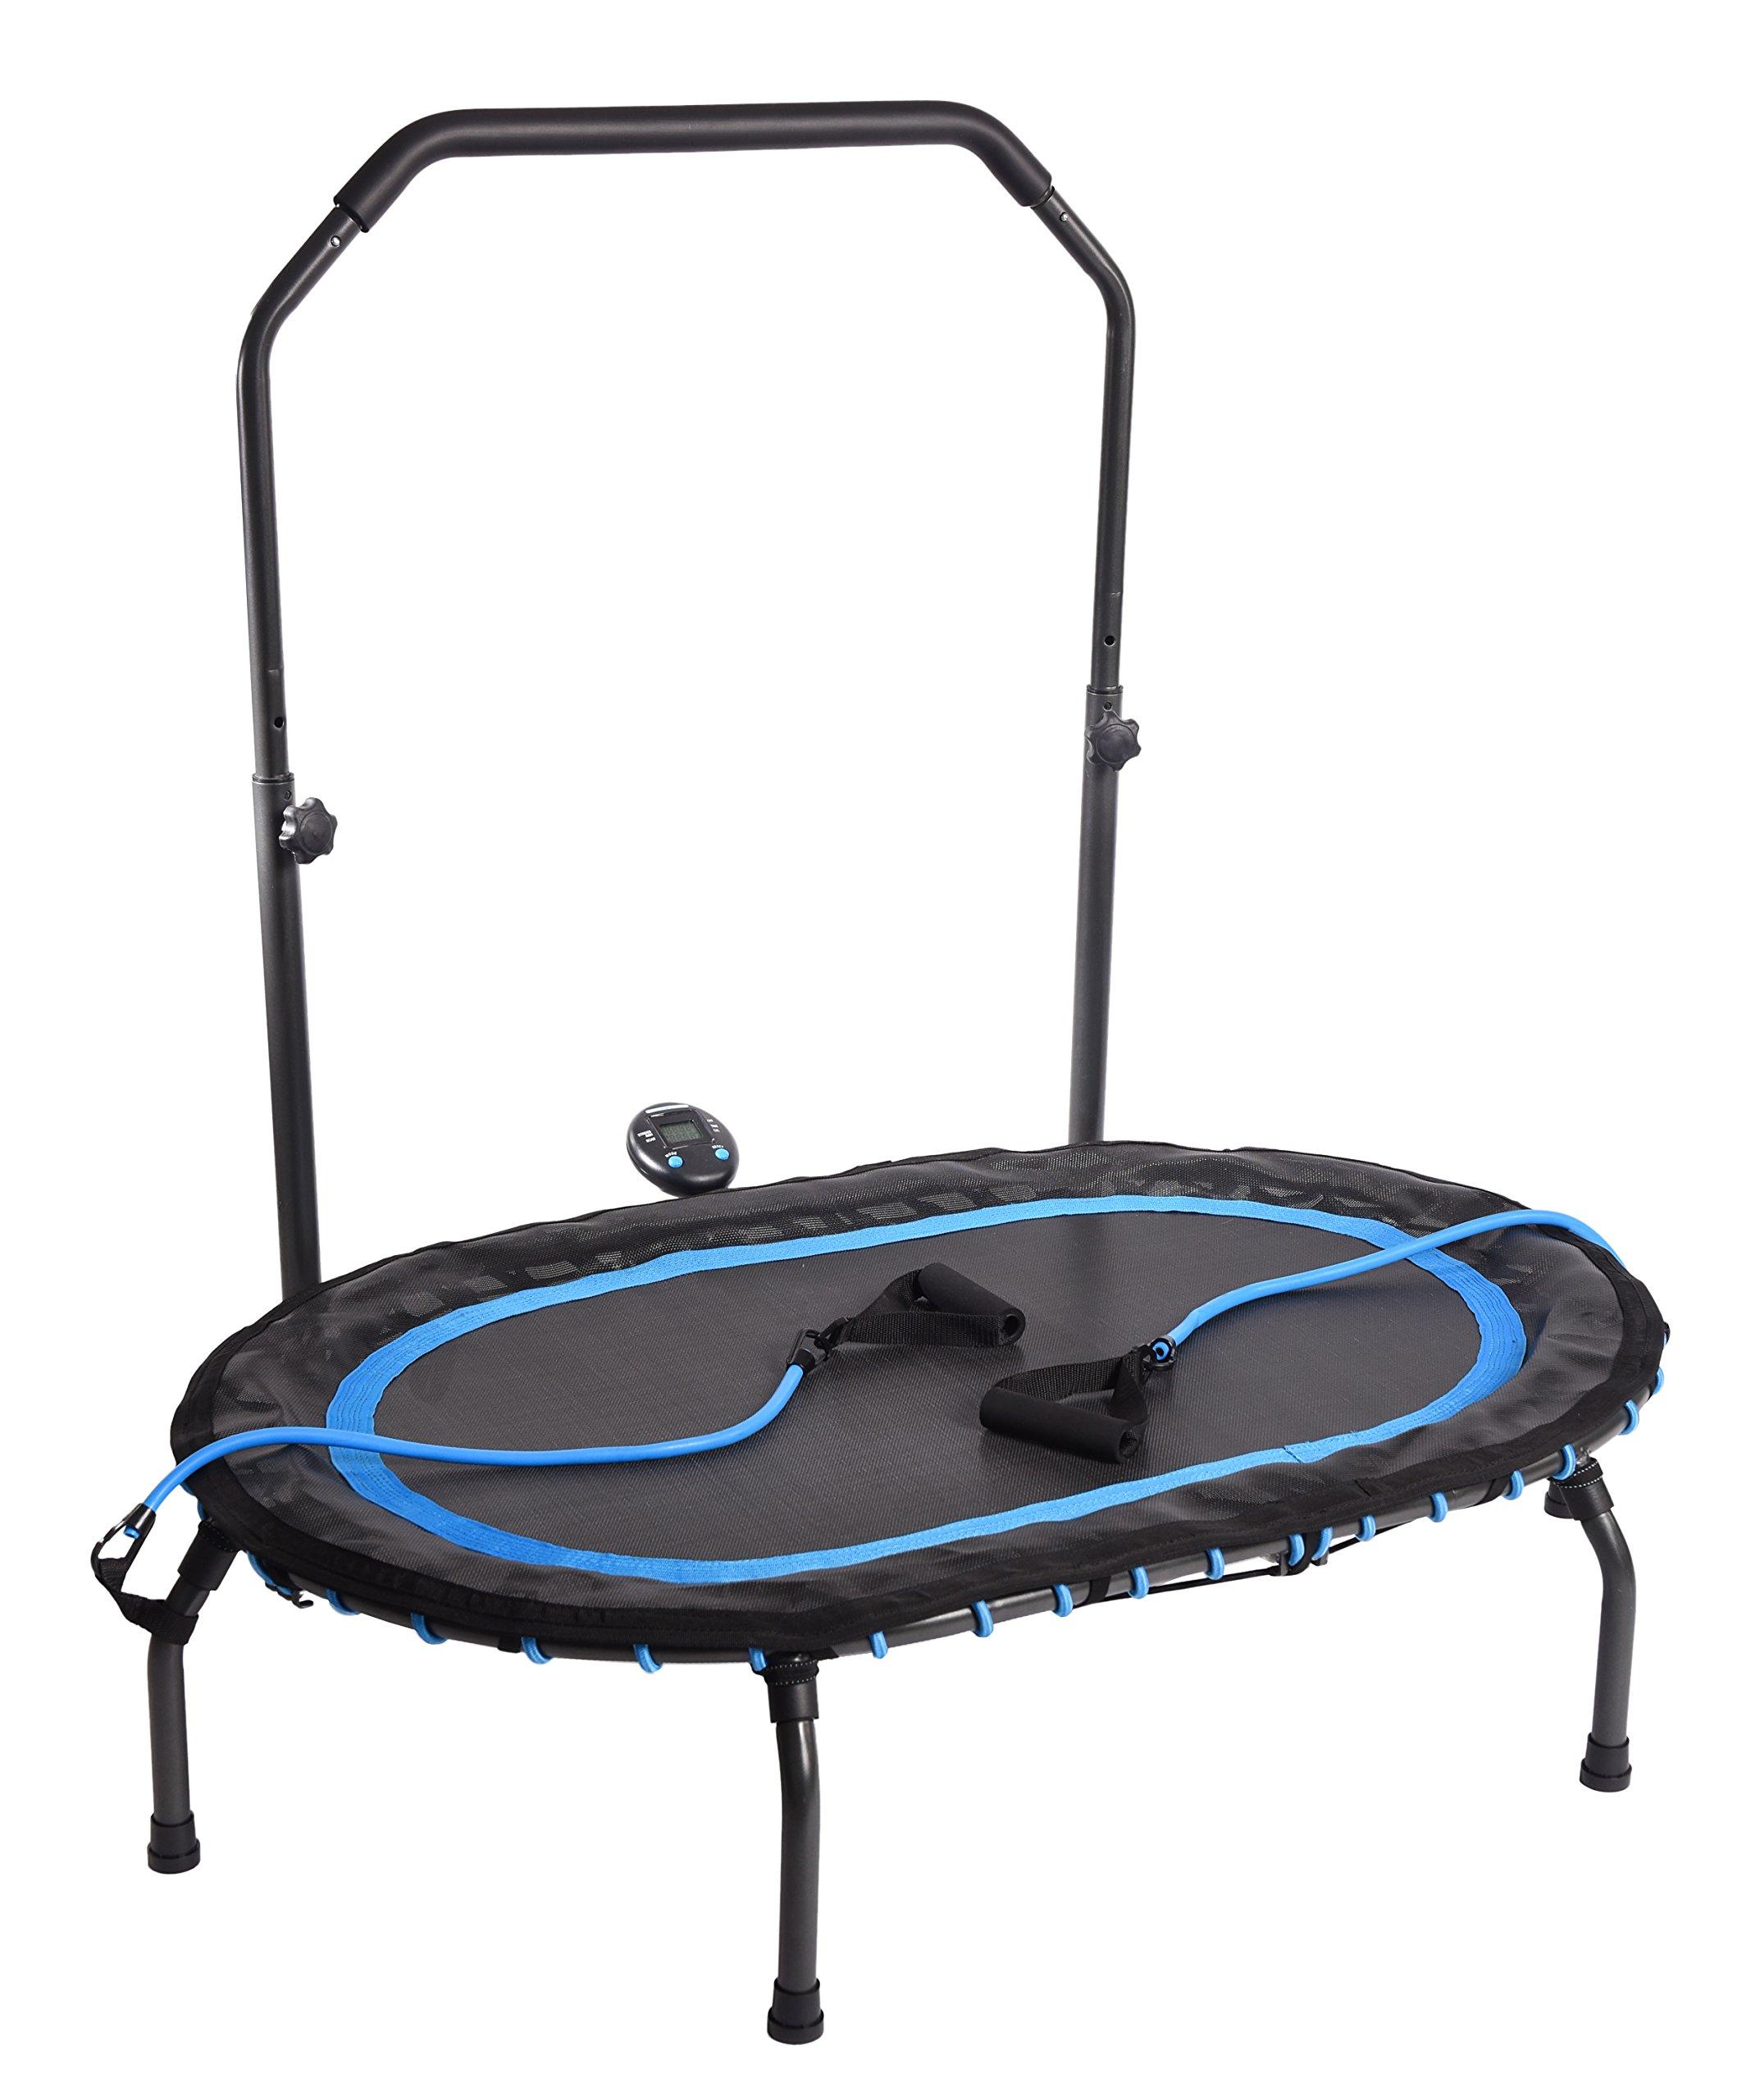 Stamina Intone Oval Fitness Trampoline by Stamina